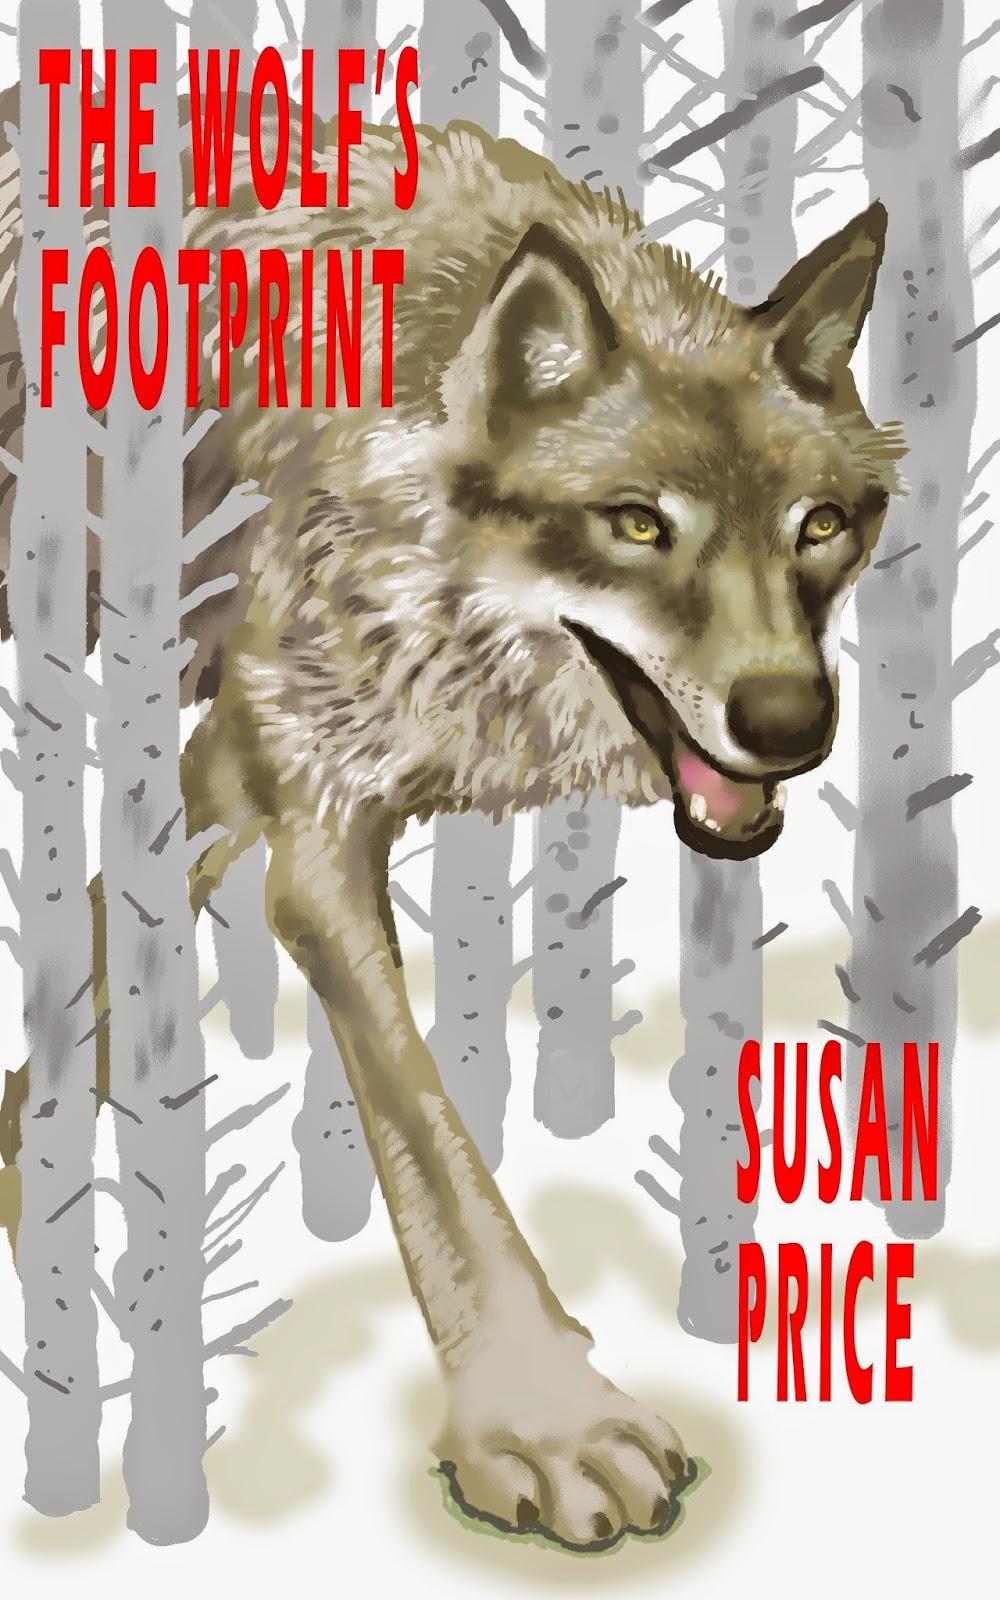 http://www.amazon.co.uk/Wolfs-Footprint-Susan-Price/dp/0992820405/